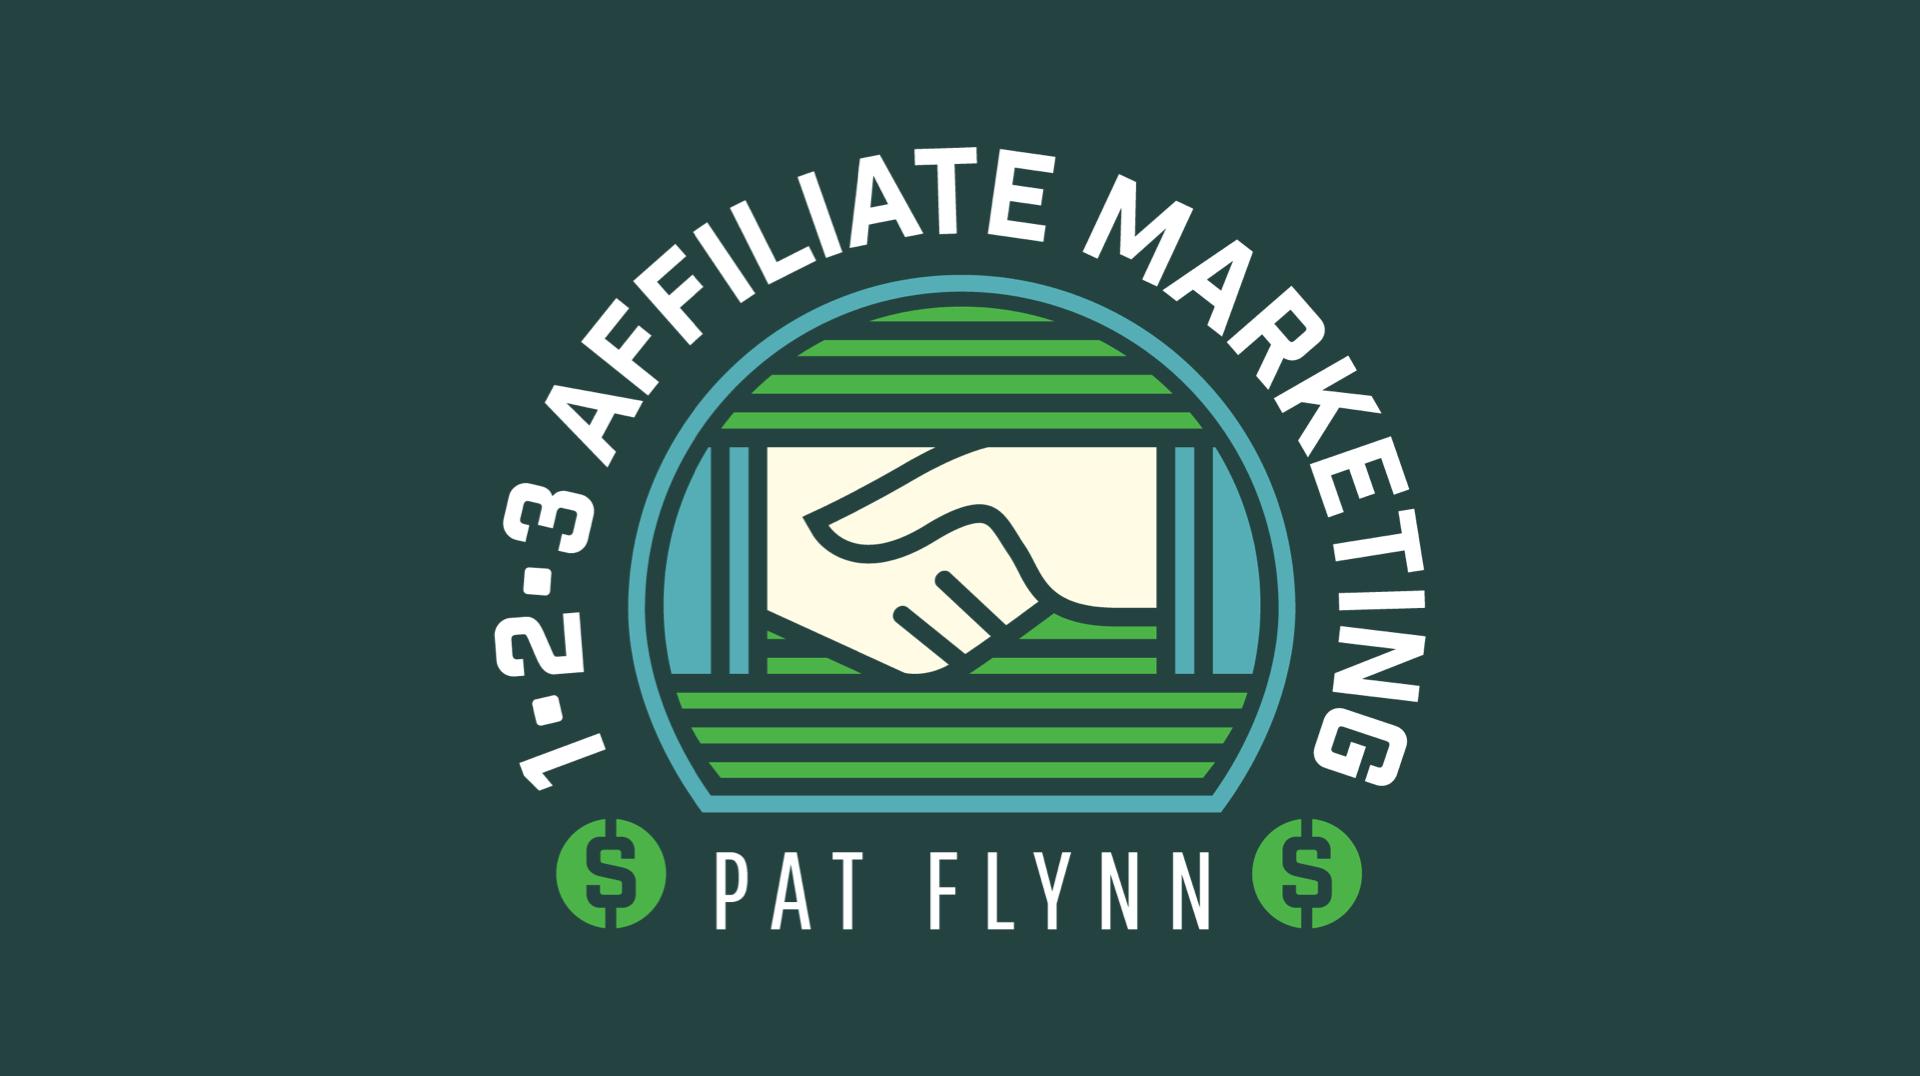 1-2-3 Affiliate Marketing Logo